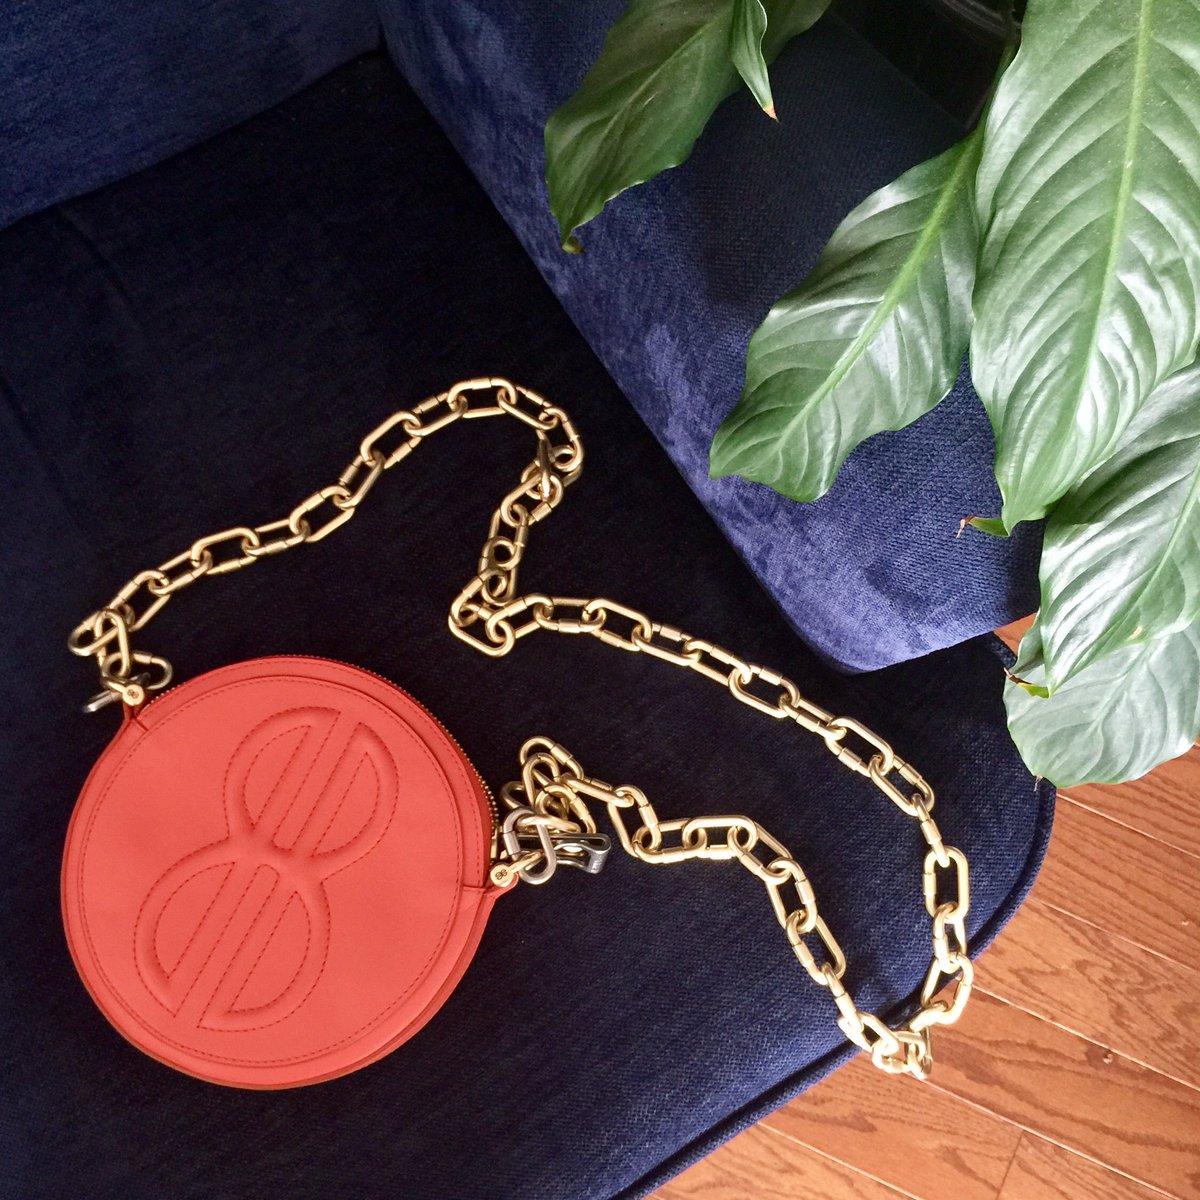 BB Large cirlce bags are the perfect evening bags with modern street edge.#billblass #blassme #redbags #handbags #circlebags #red #shopping https://t.co/47xtLvC3BN